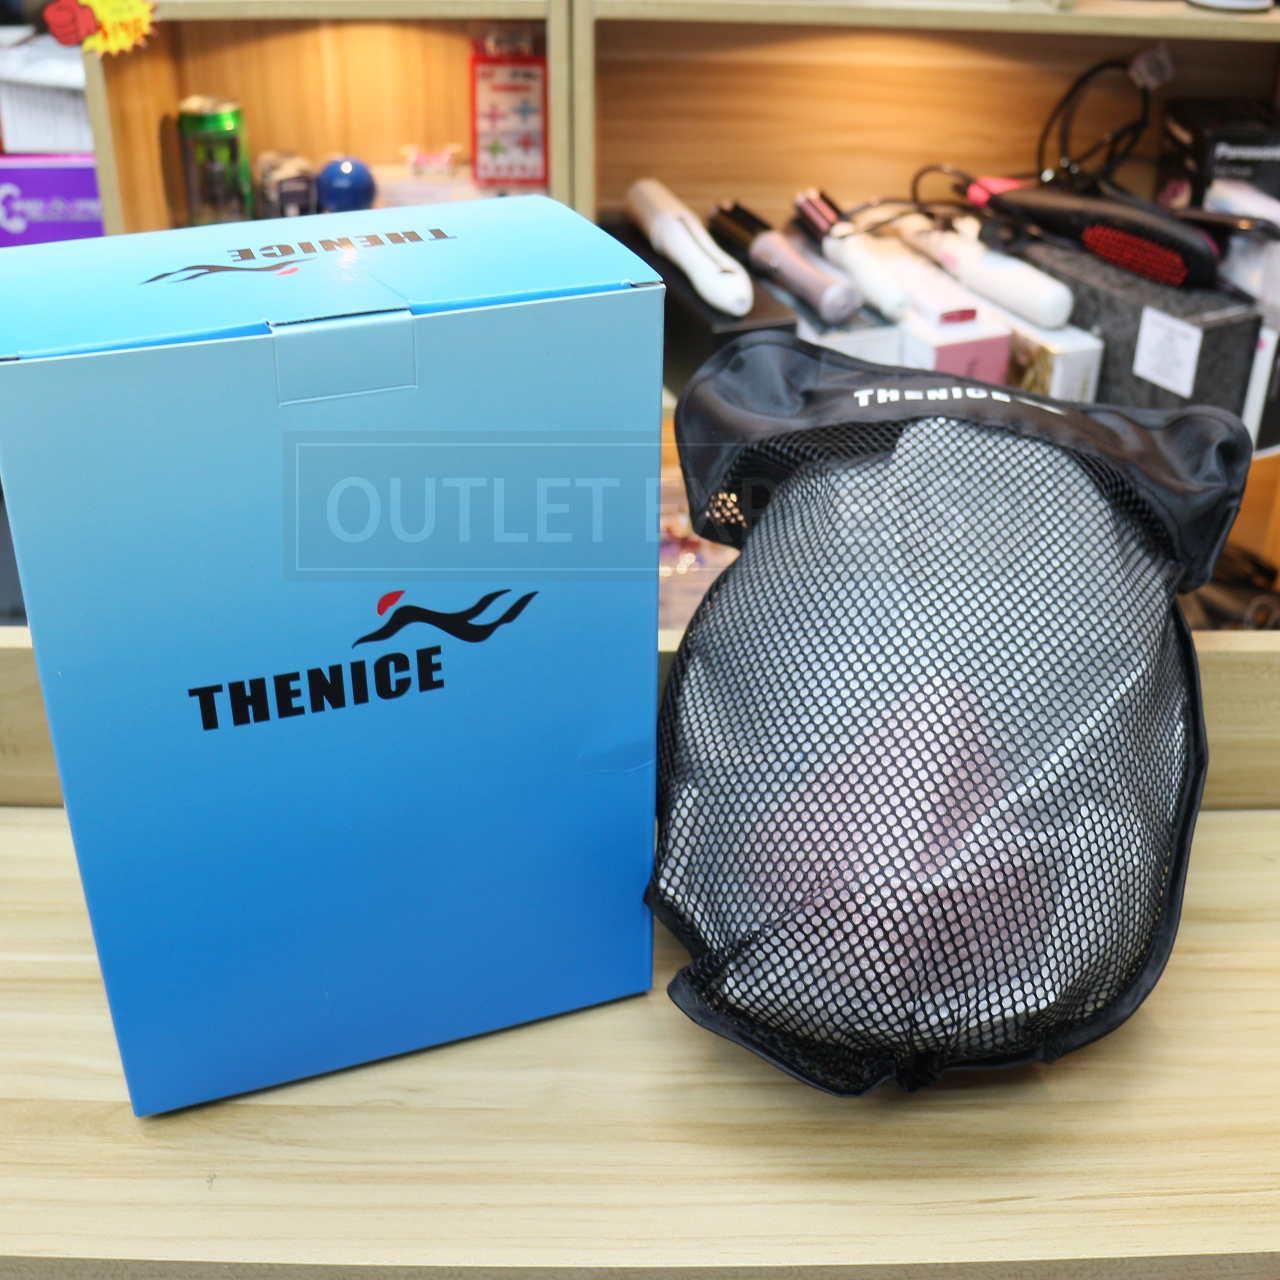 THENICE全乾式防霧浮潛面罩包裝及包裝袋- Outlet Express HK生活百貨城實拍相片